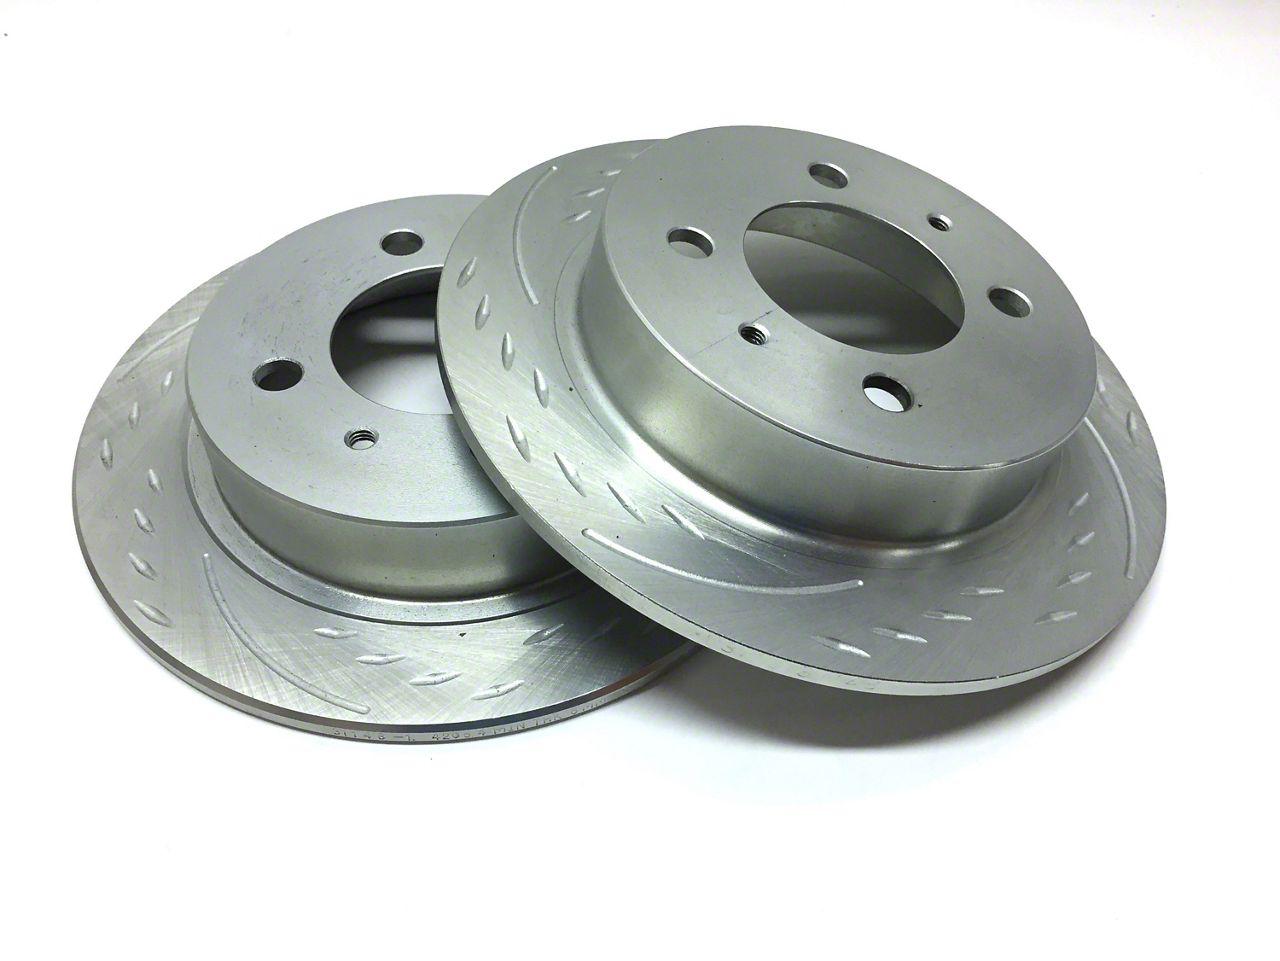 SP Performance Diamond Slot Rotors w/ Silver Zinc Plating - Rear Pair (02-18 RAM 1500)